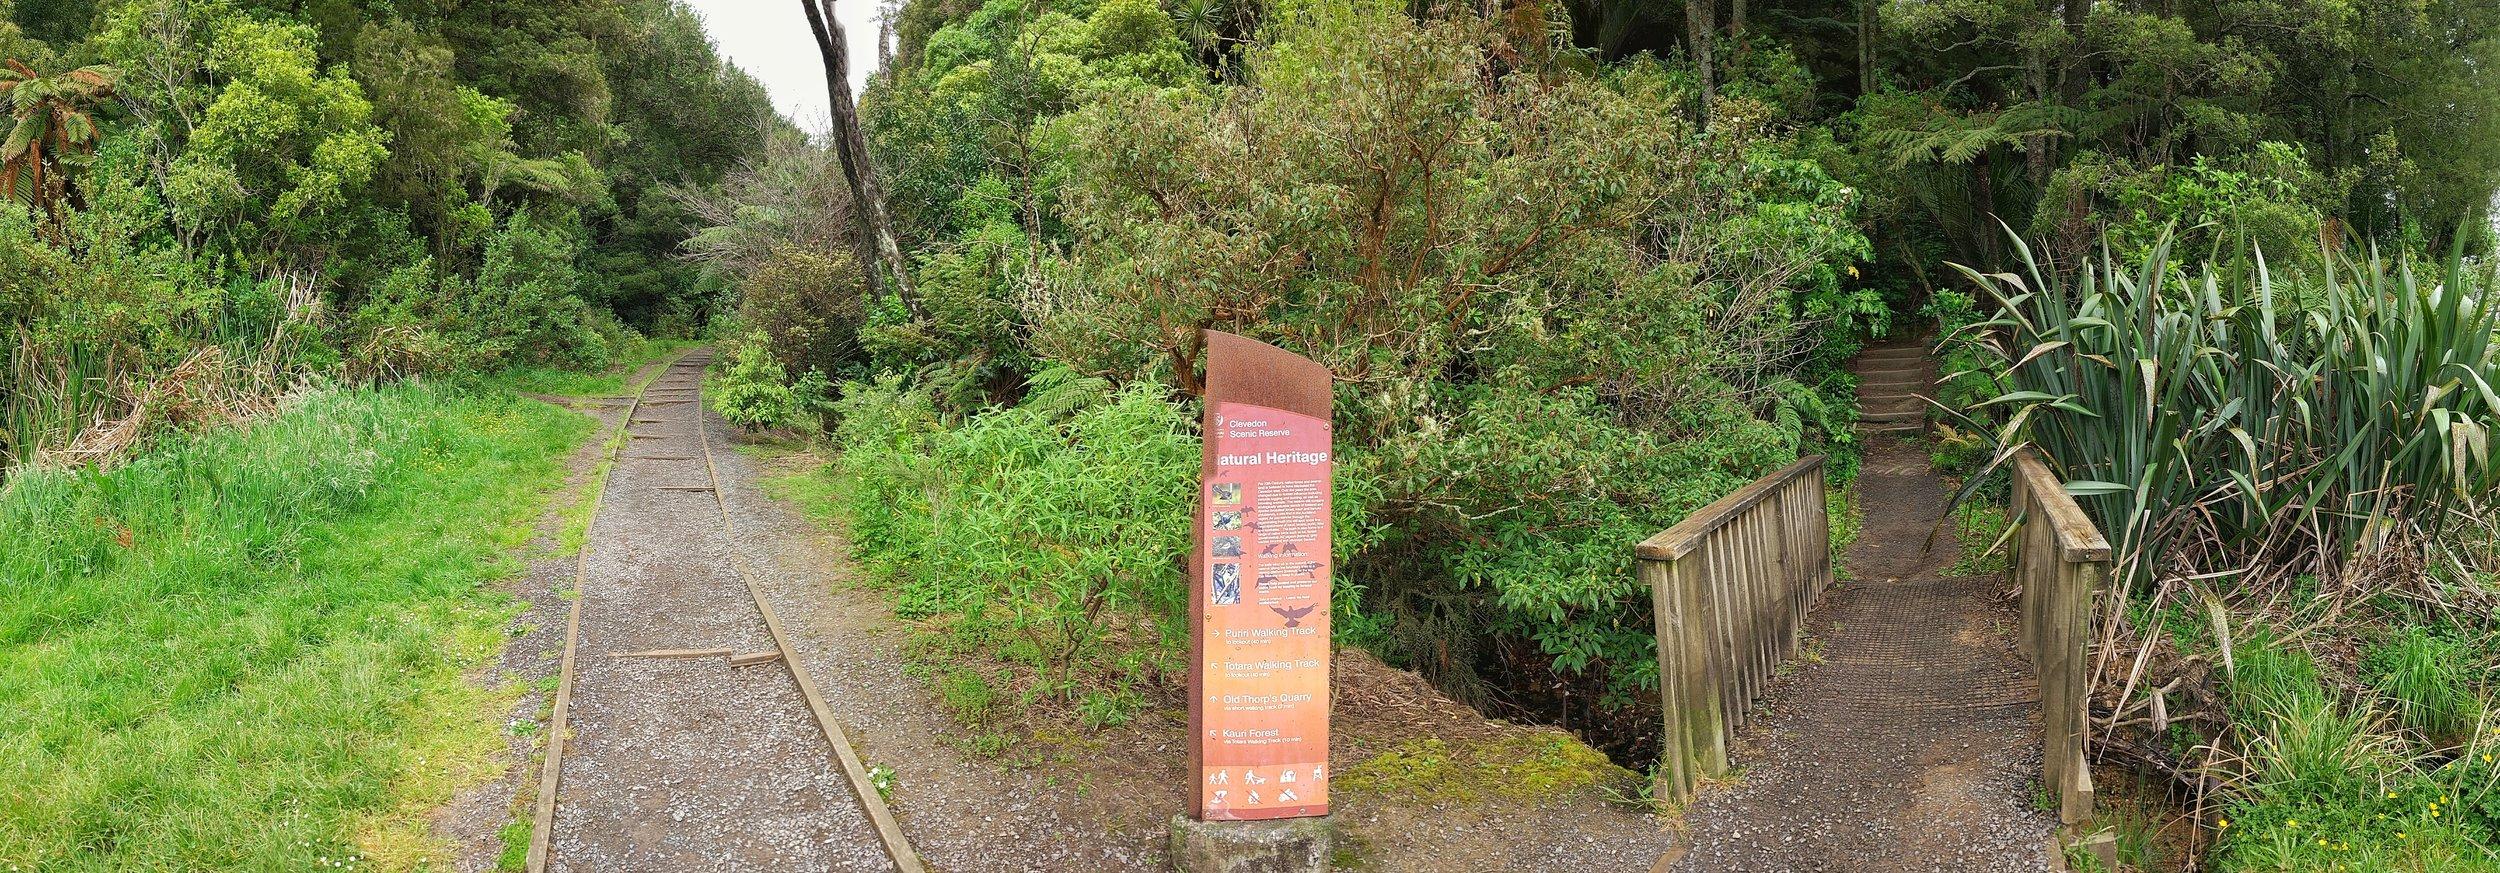 20171022_New_Zealand_Clevedon_scenic_reserve_base_path_pano.jpeg